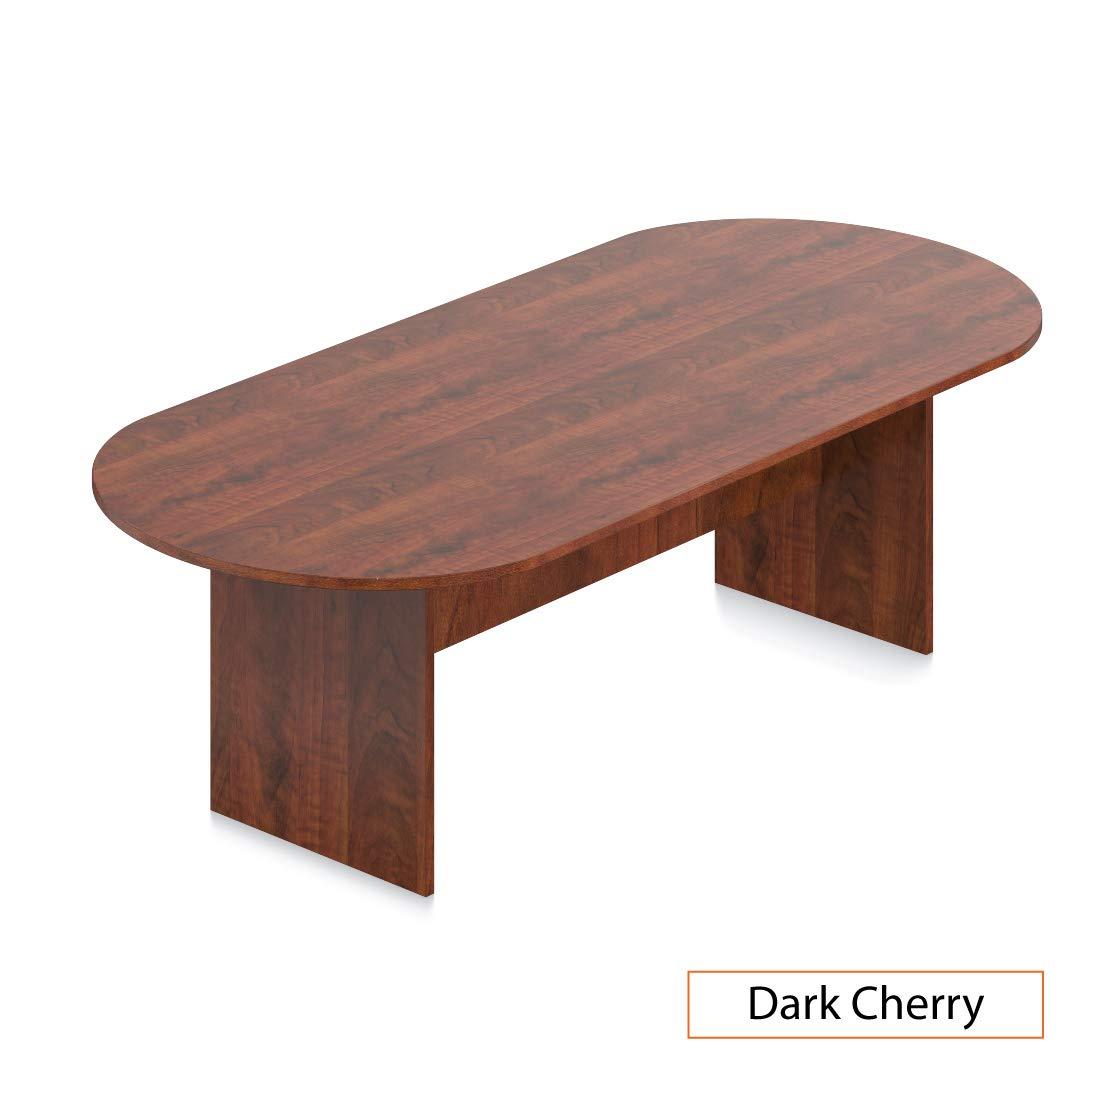 GOF 6FT, 8FT, 10FT Conference Table Chair (G10900B) Set, Cherry, Espresso, Mahogany, Walnut, Artisan Grey (8FT, Dark Cherry)